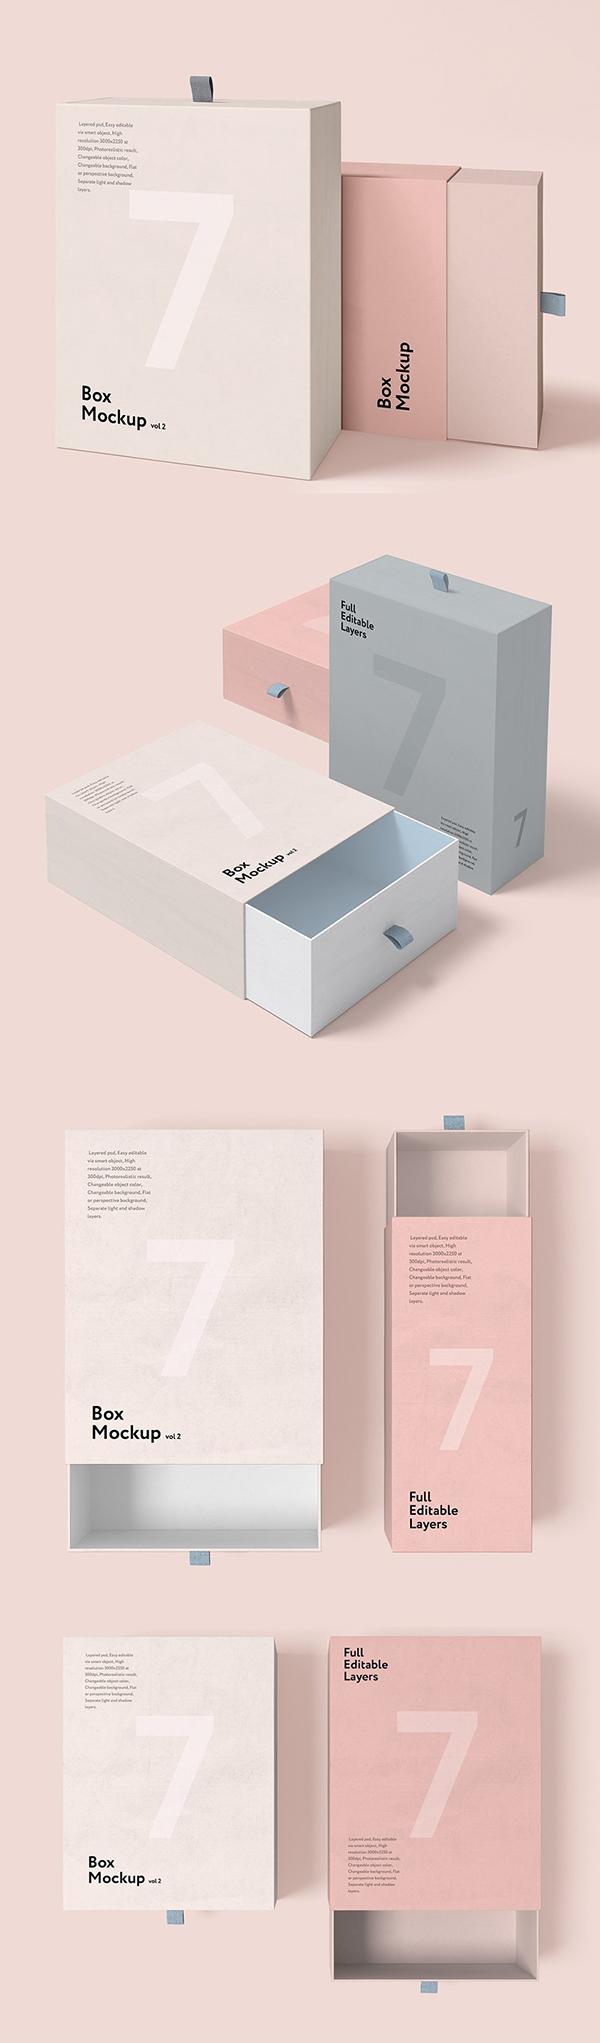 Box Mockup vol.2